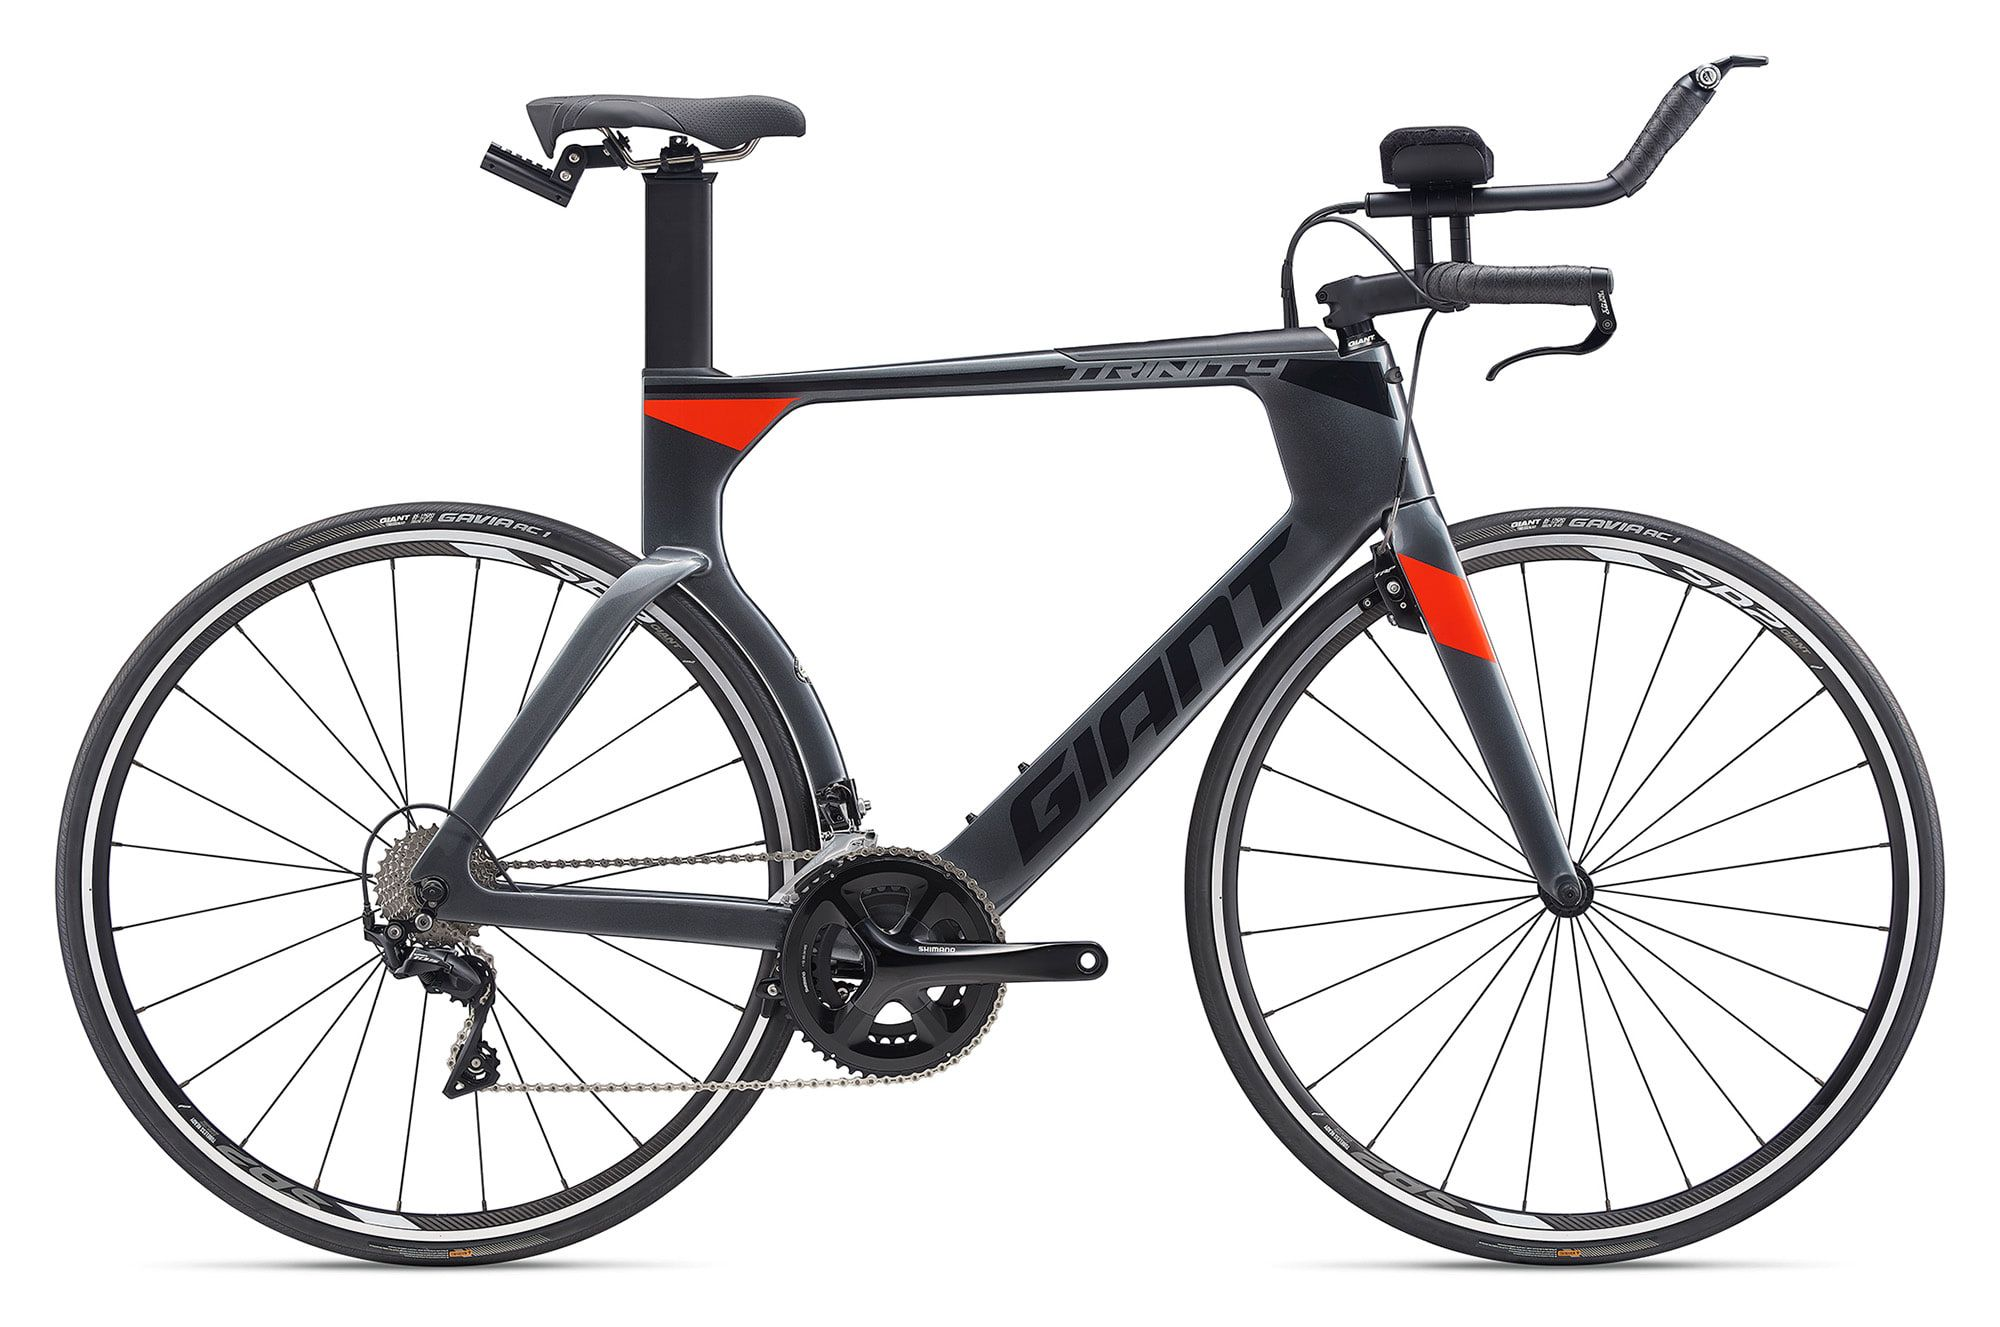 Giant Trinity Advanced Tt Bike 2020 | Tri/time trial